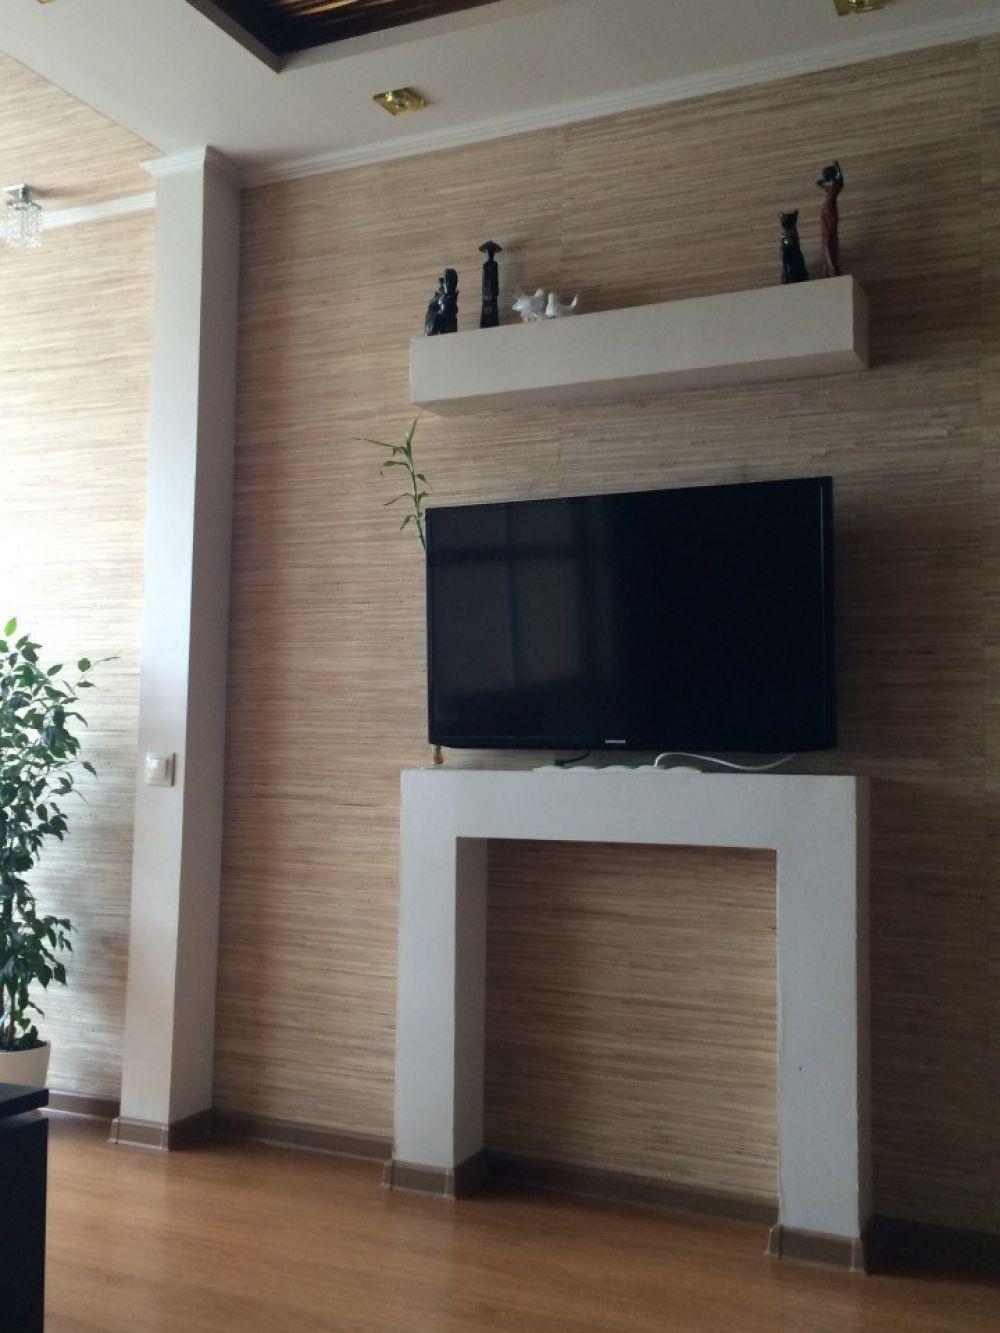 1-комнатная квартира поселок Свердловский ул.Заводская д.1, фото 1